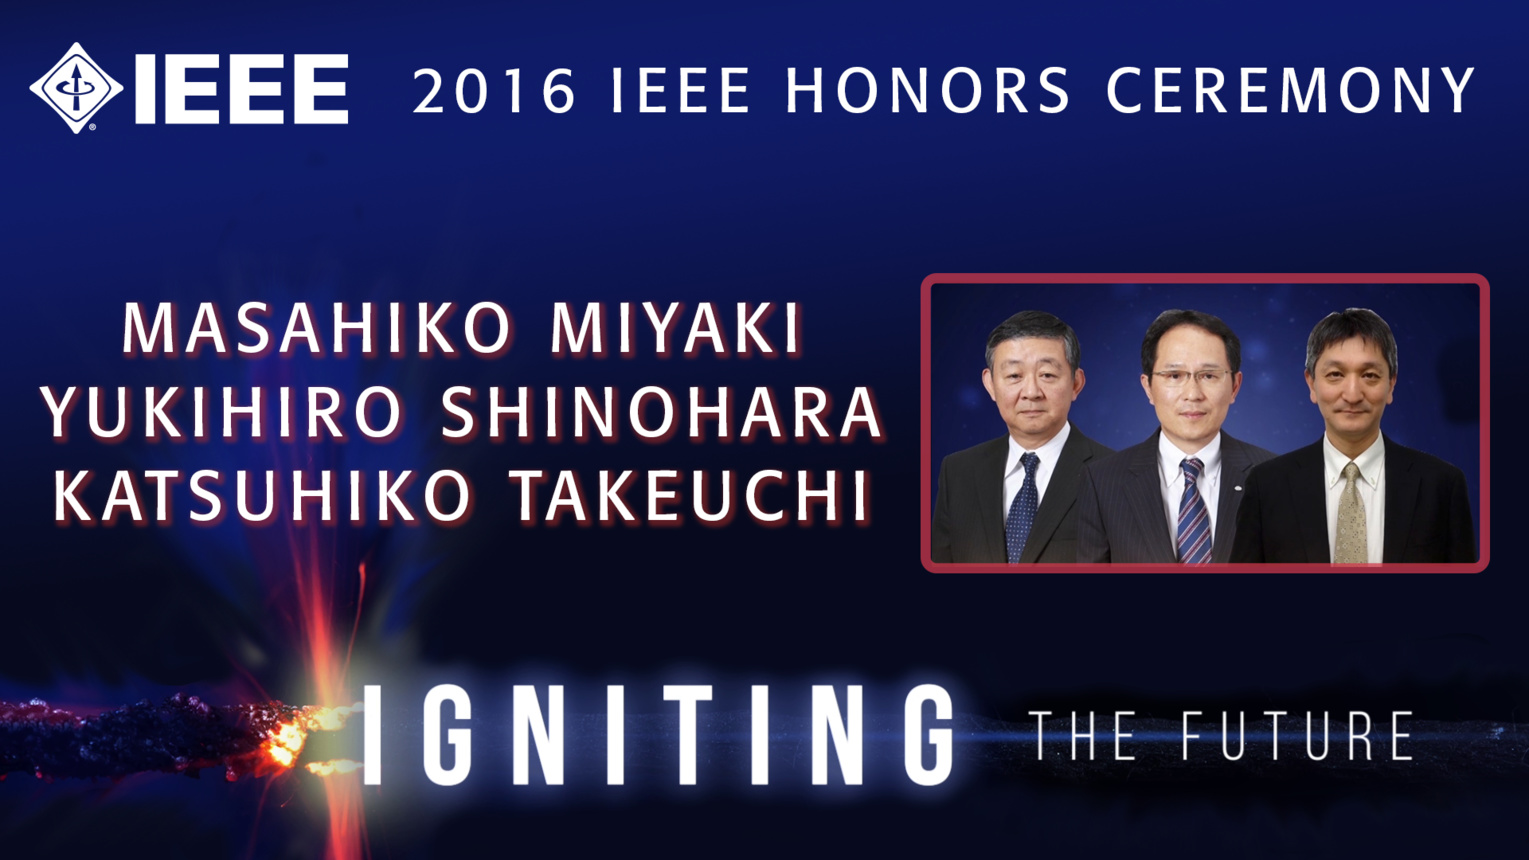 Masahiko Miyaki, Yukihiro Shinohara and Katsuhiko Takeuchi accept the IEEE Medal for Environmental and Safety Technologies - Honors Ceremony 2016